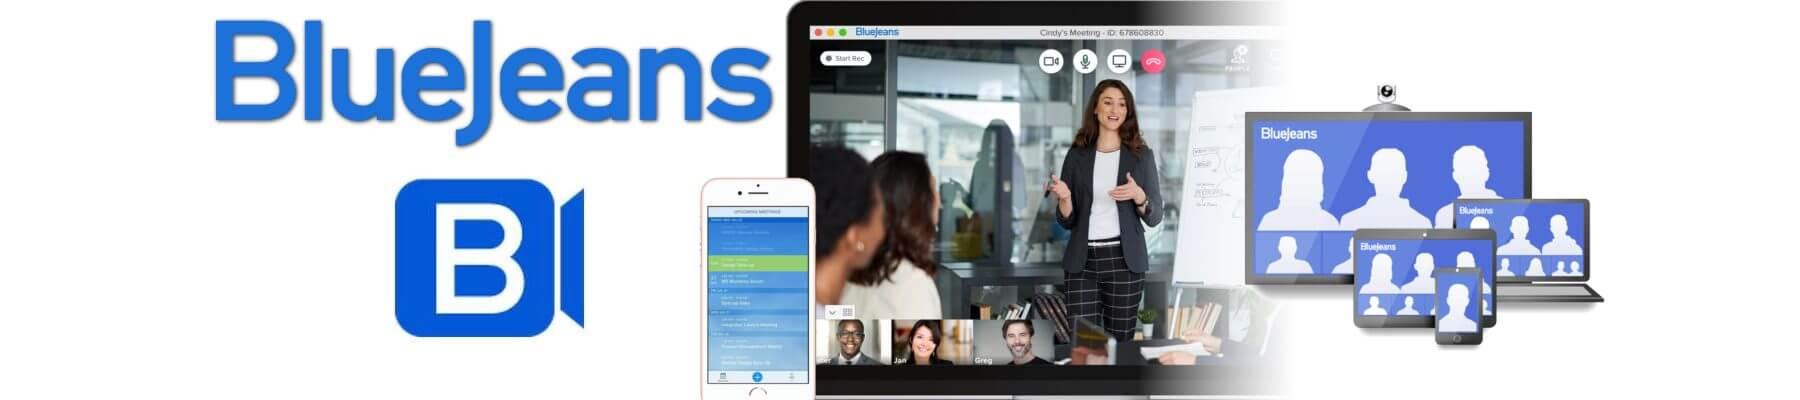 Blue Jeans Cloud Video Conferencing Uganda